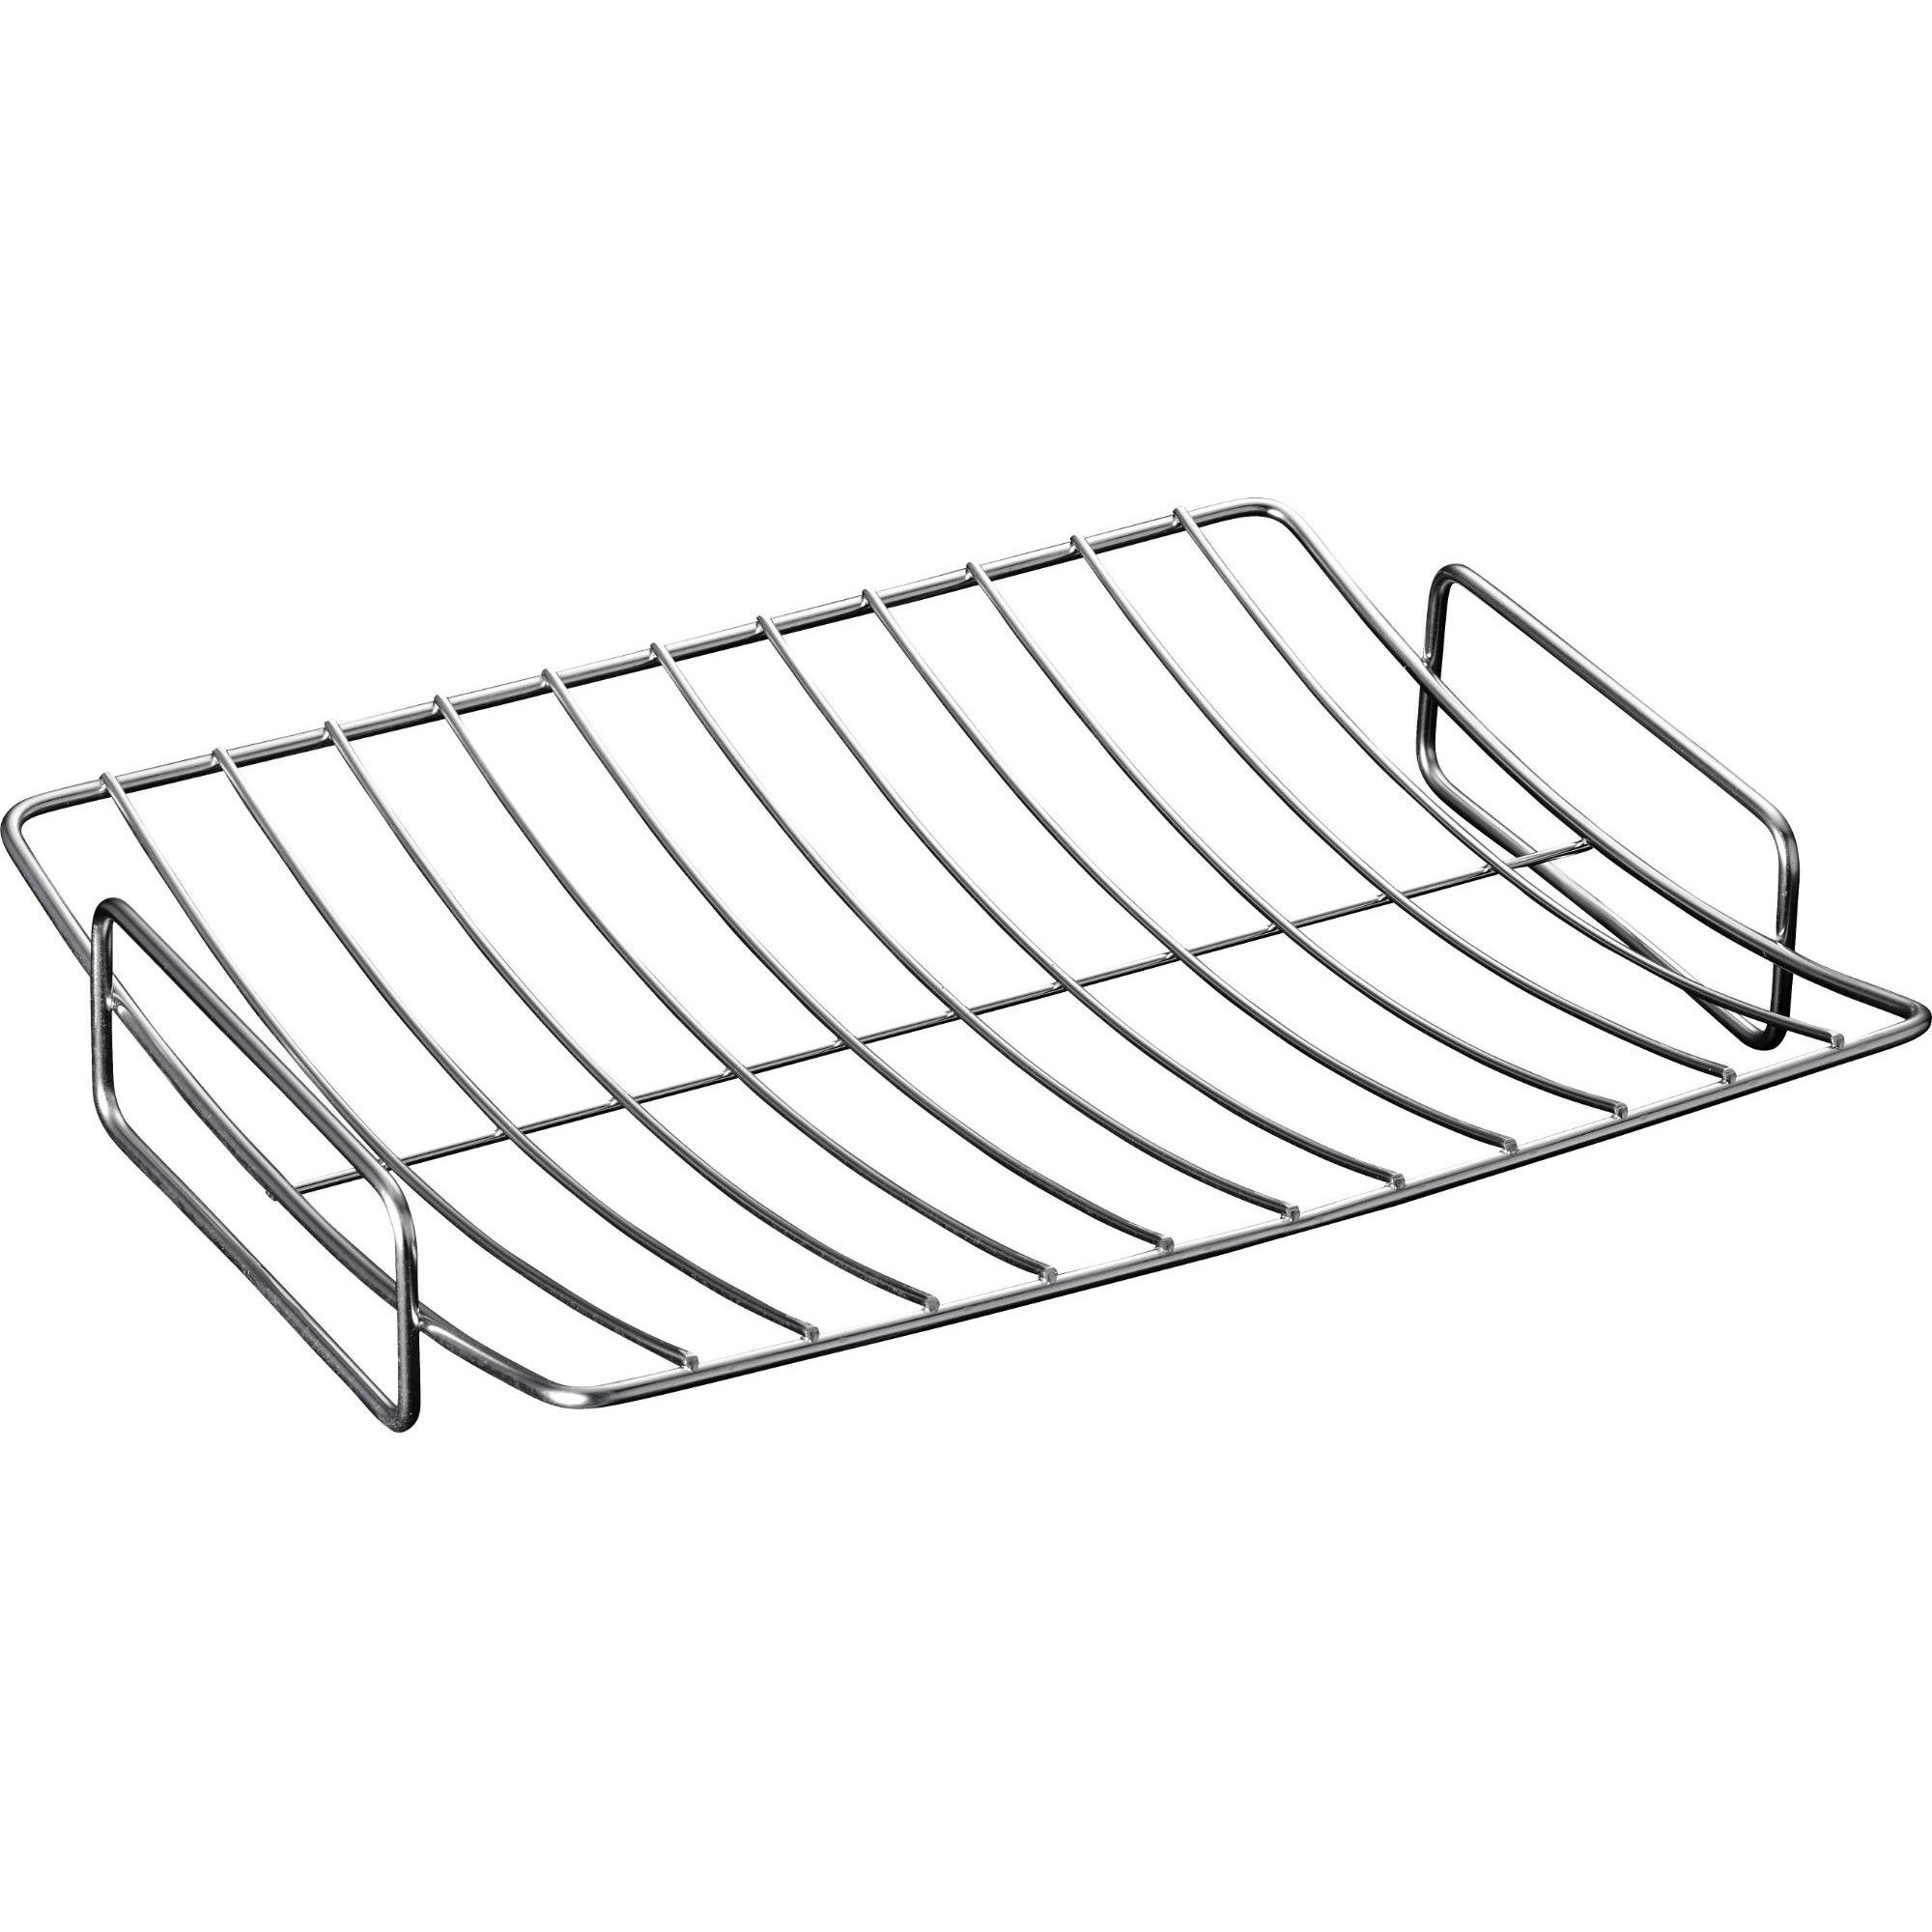 Scanpan Galler för långpanna 35cm x 30cm